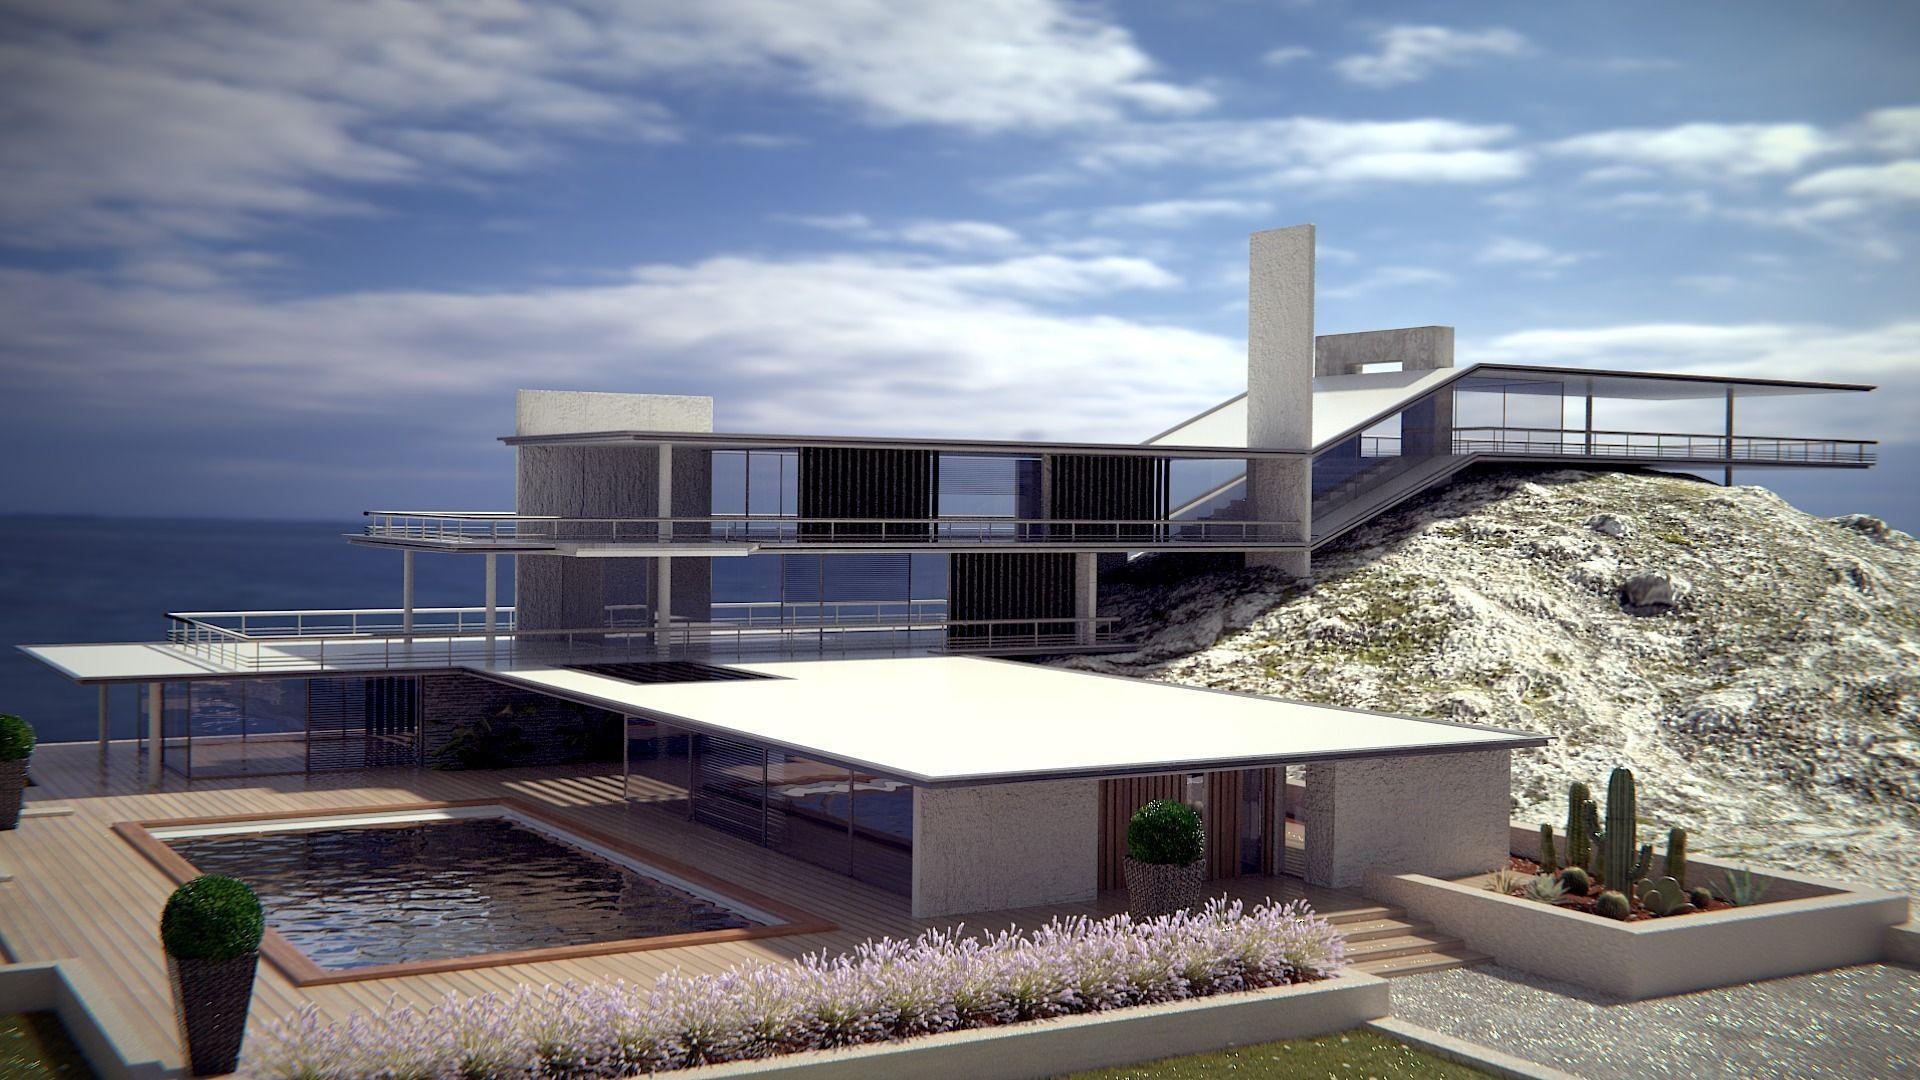 Best Kitchen Gallery: Modern Style Original Sea House 3d Cgtrader of Modern Style House on rachelxblog.com